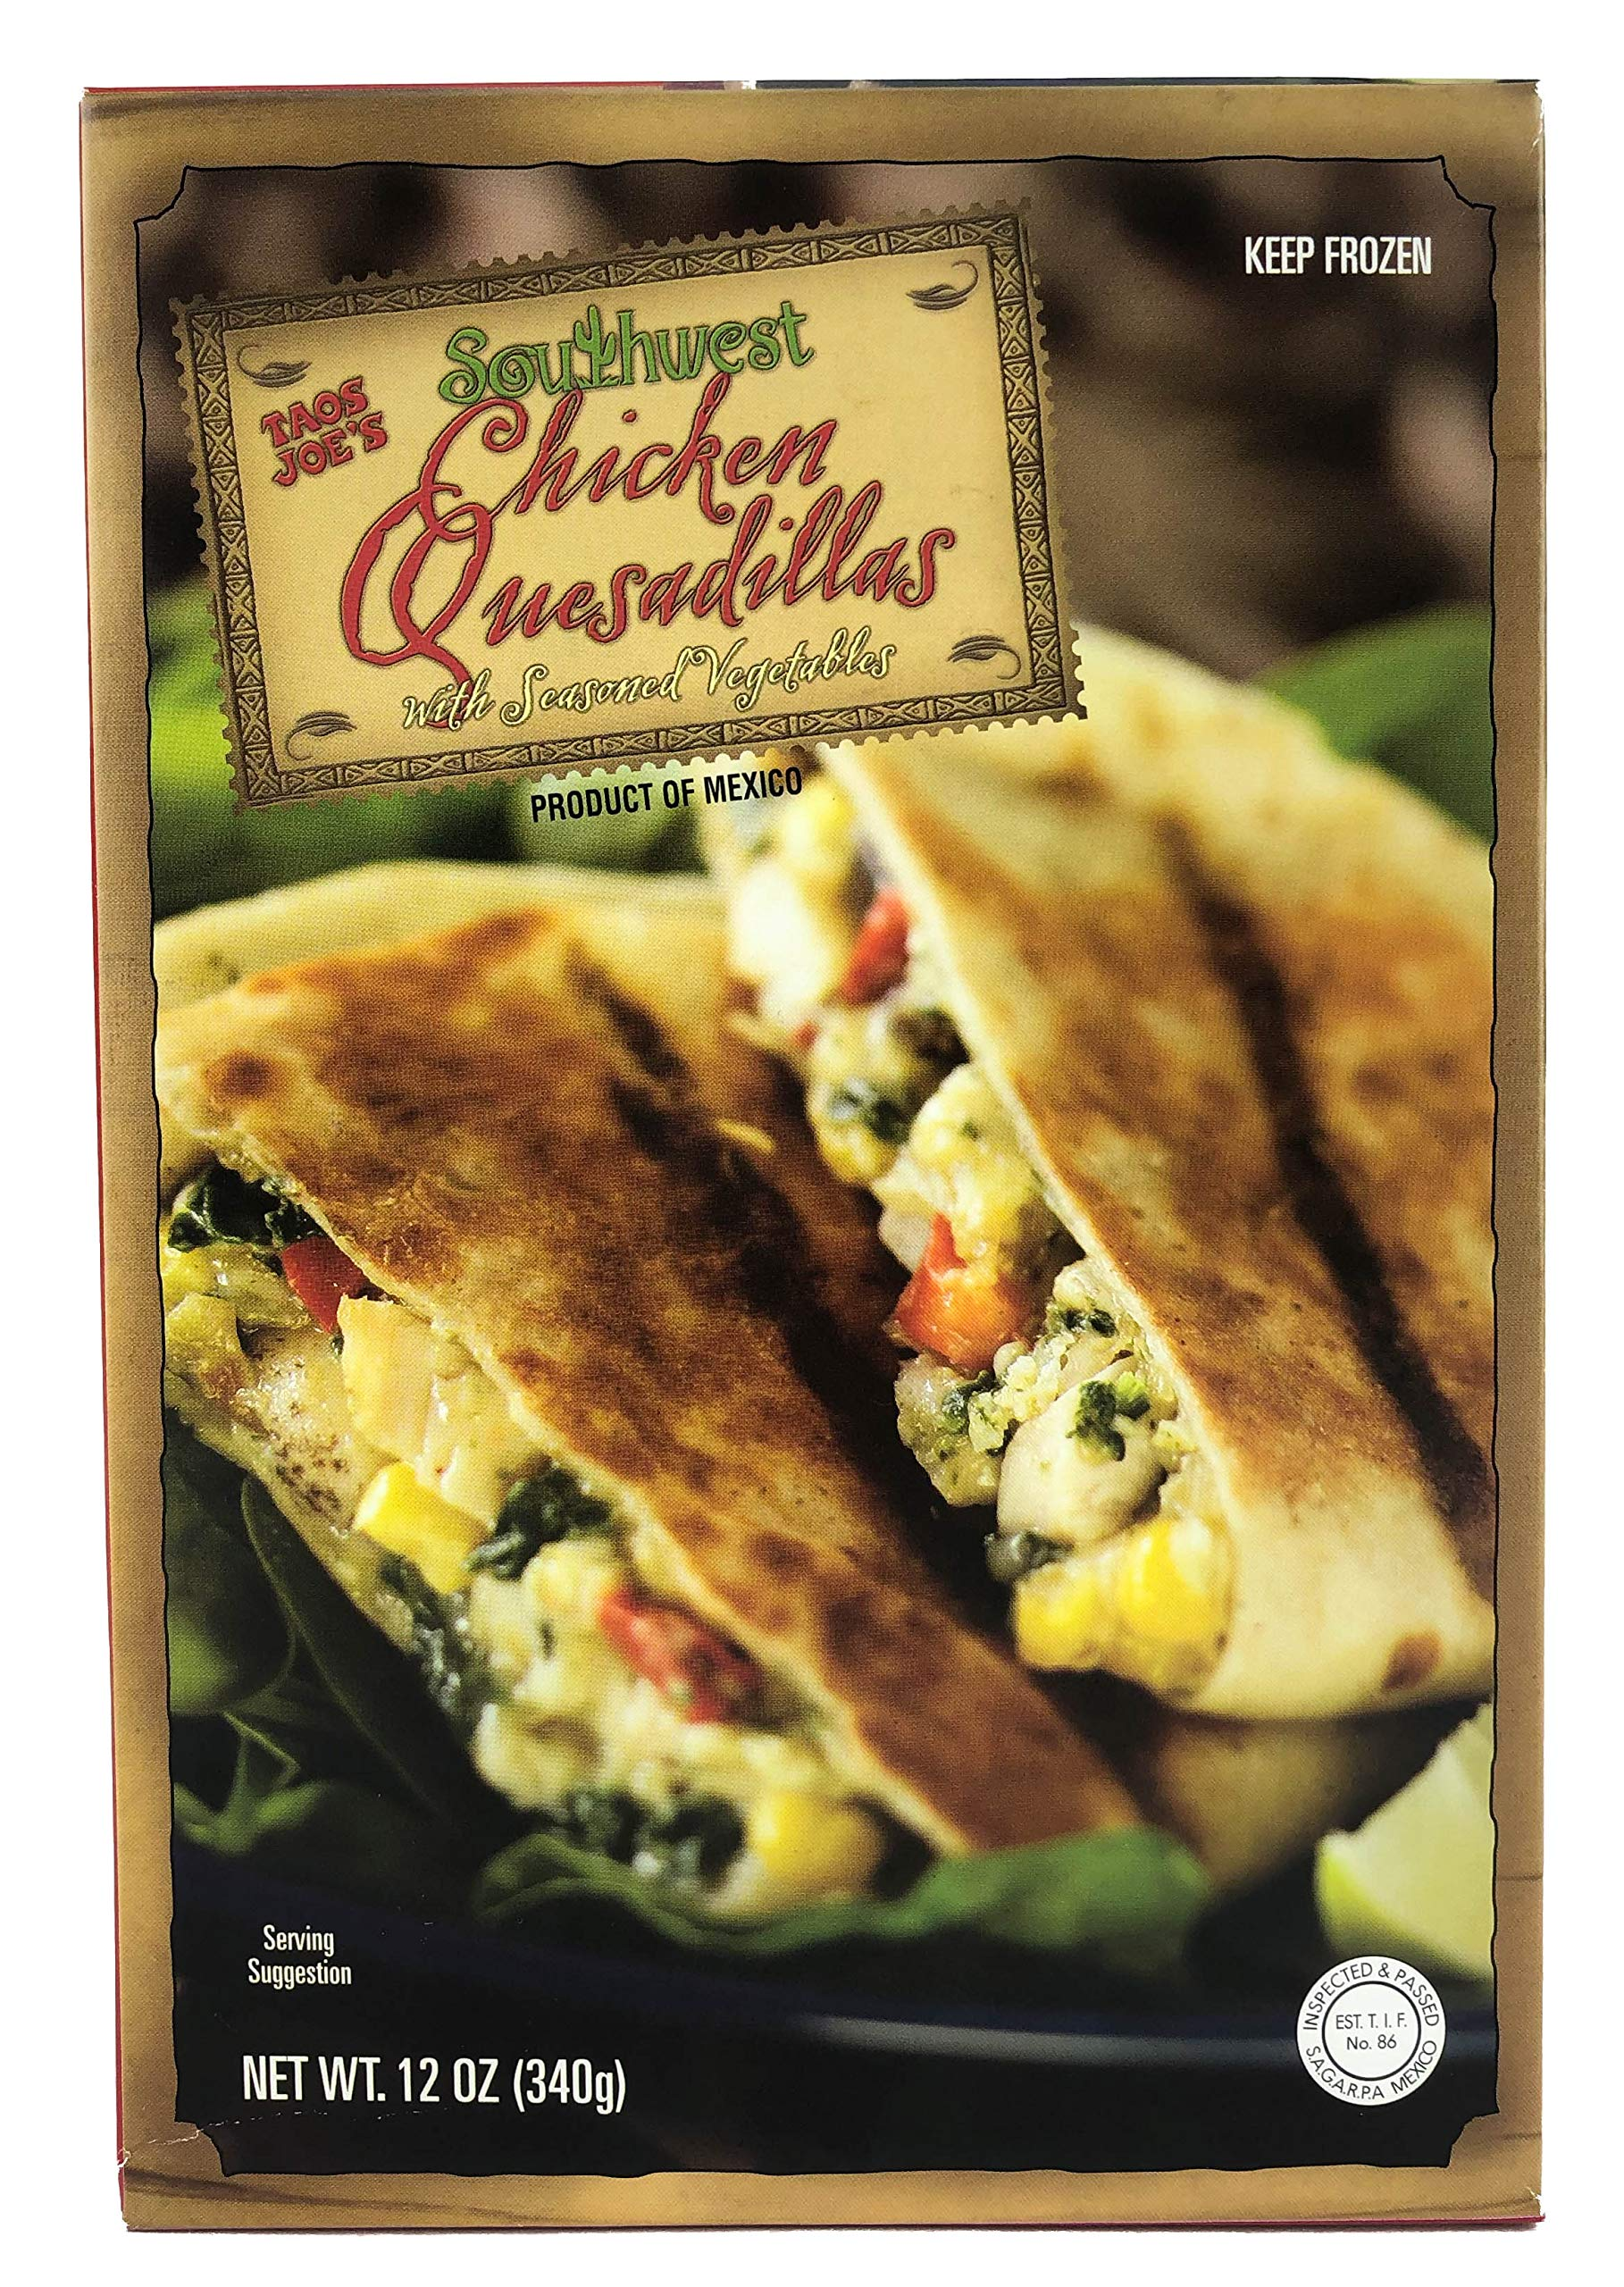 Trader Joe's Southwest Chicken Quesadillas with Seasoned Vegetables (6 Pack)